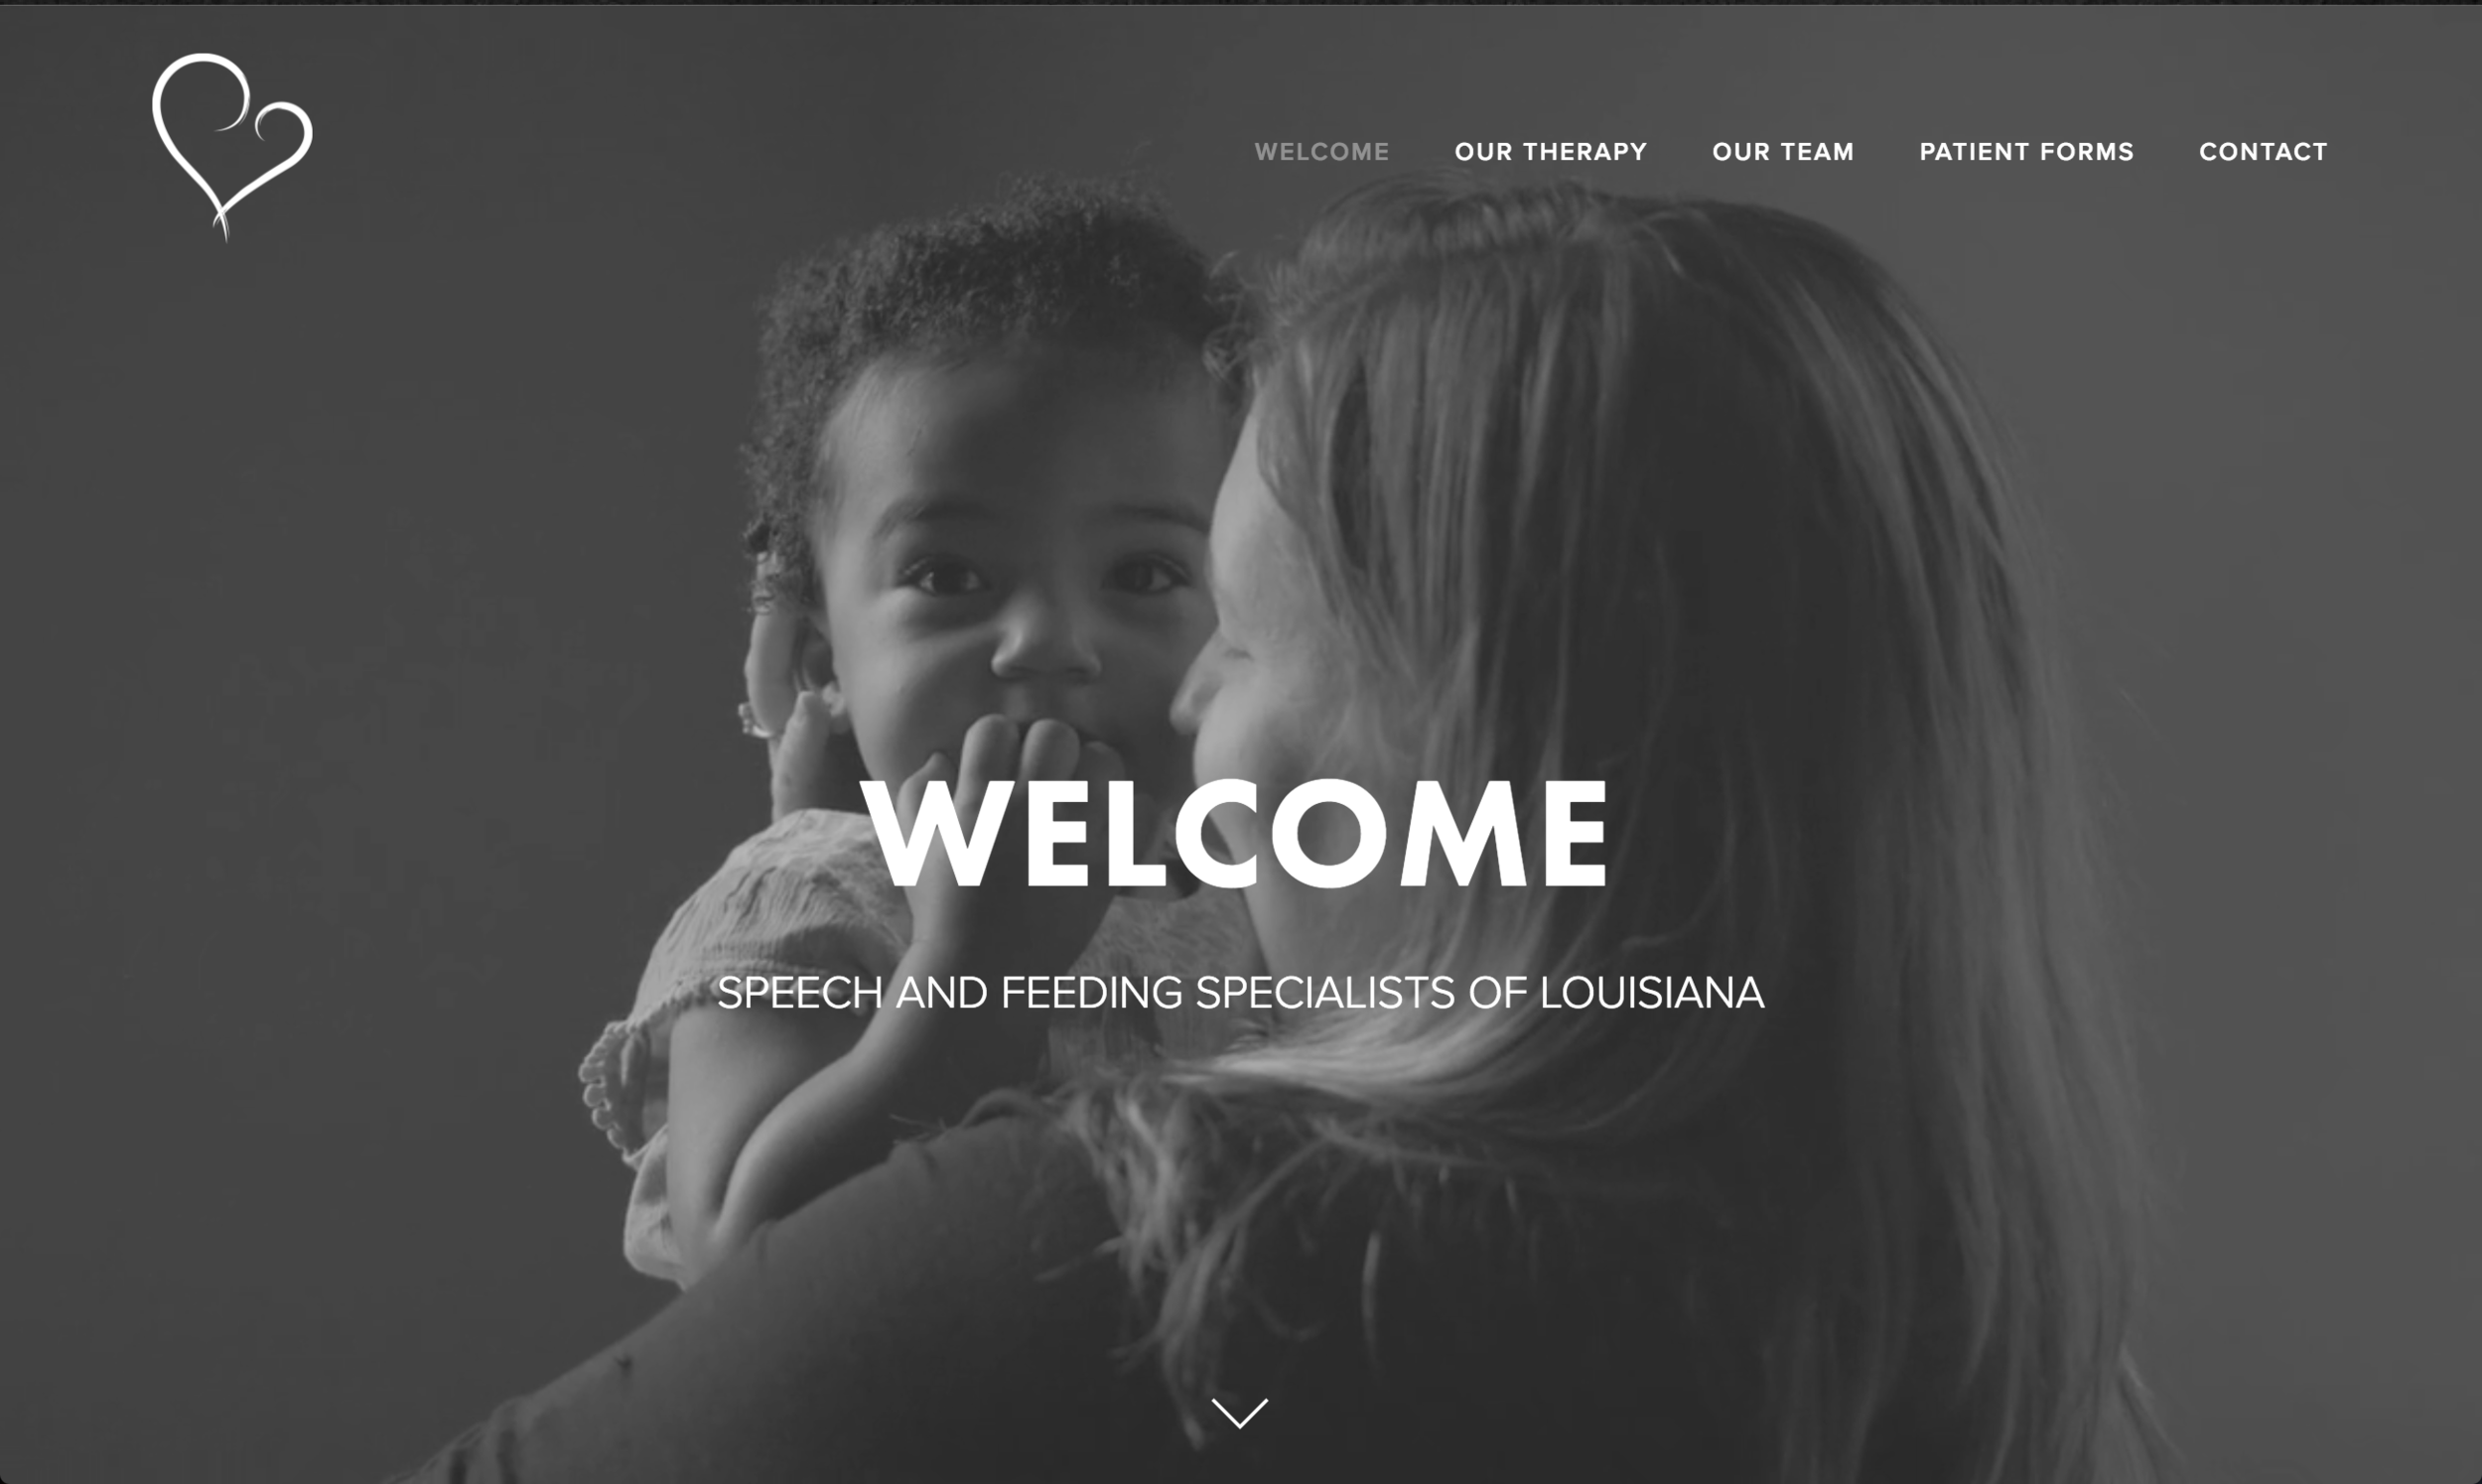 speech and feeding Specialists of Louisiana Website